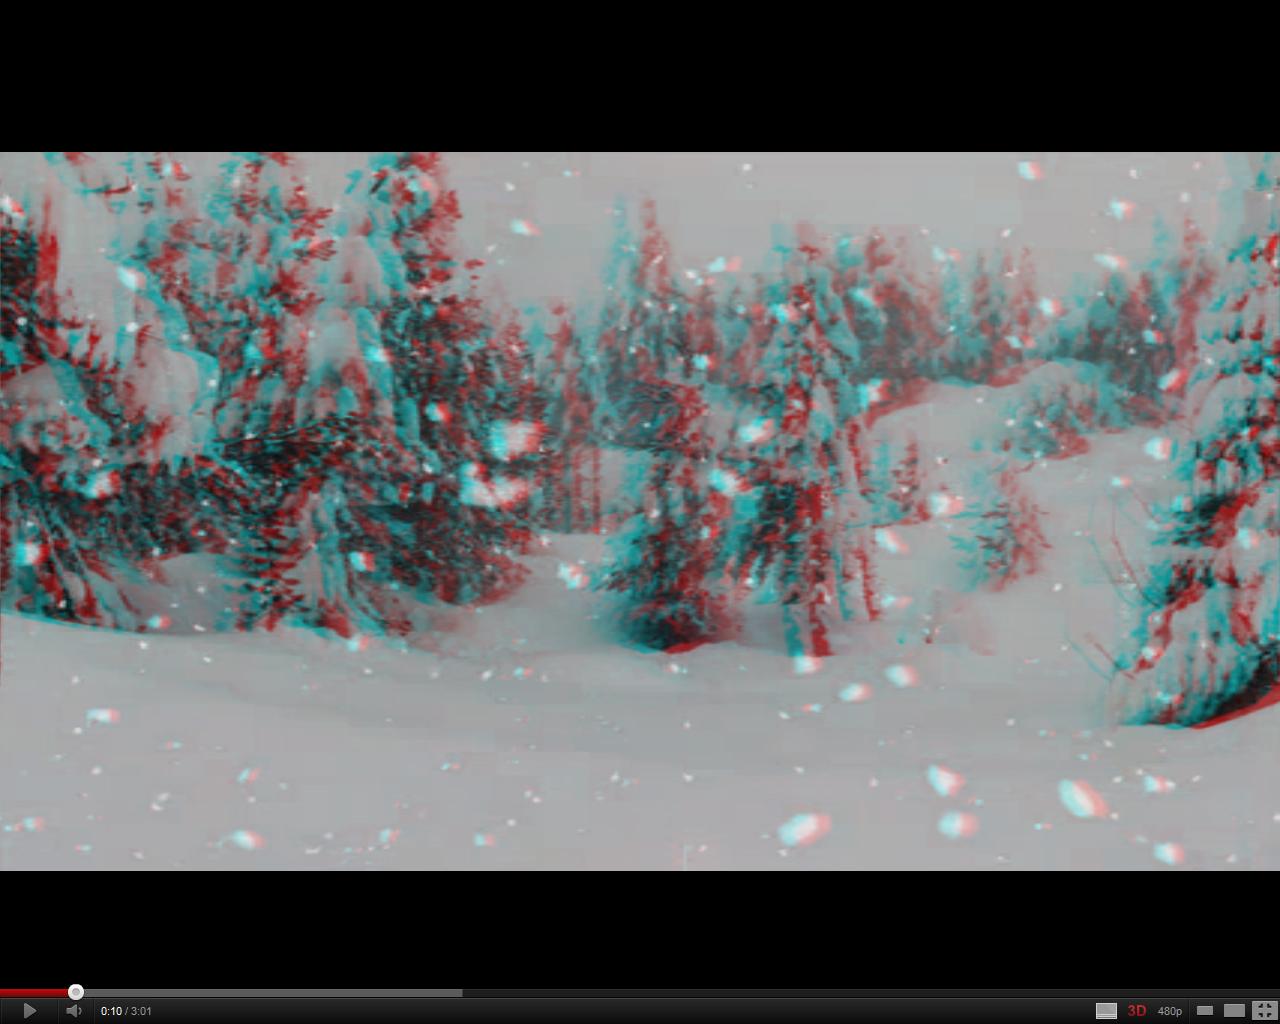 Erster 3D-Film für Engadin St. Moritz Slide 1